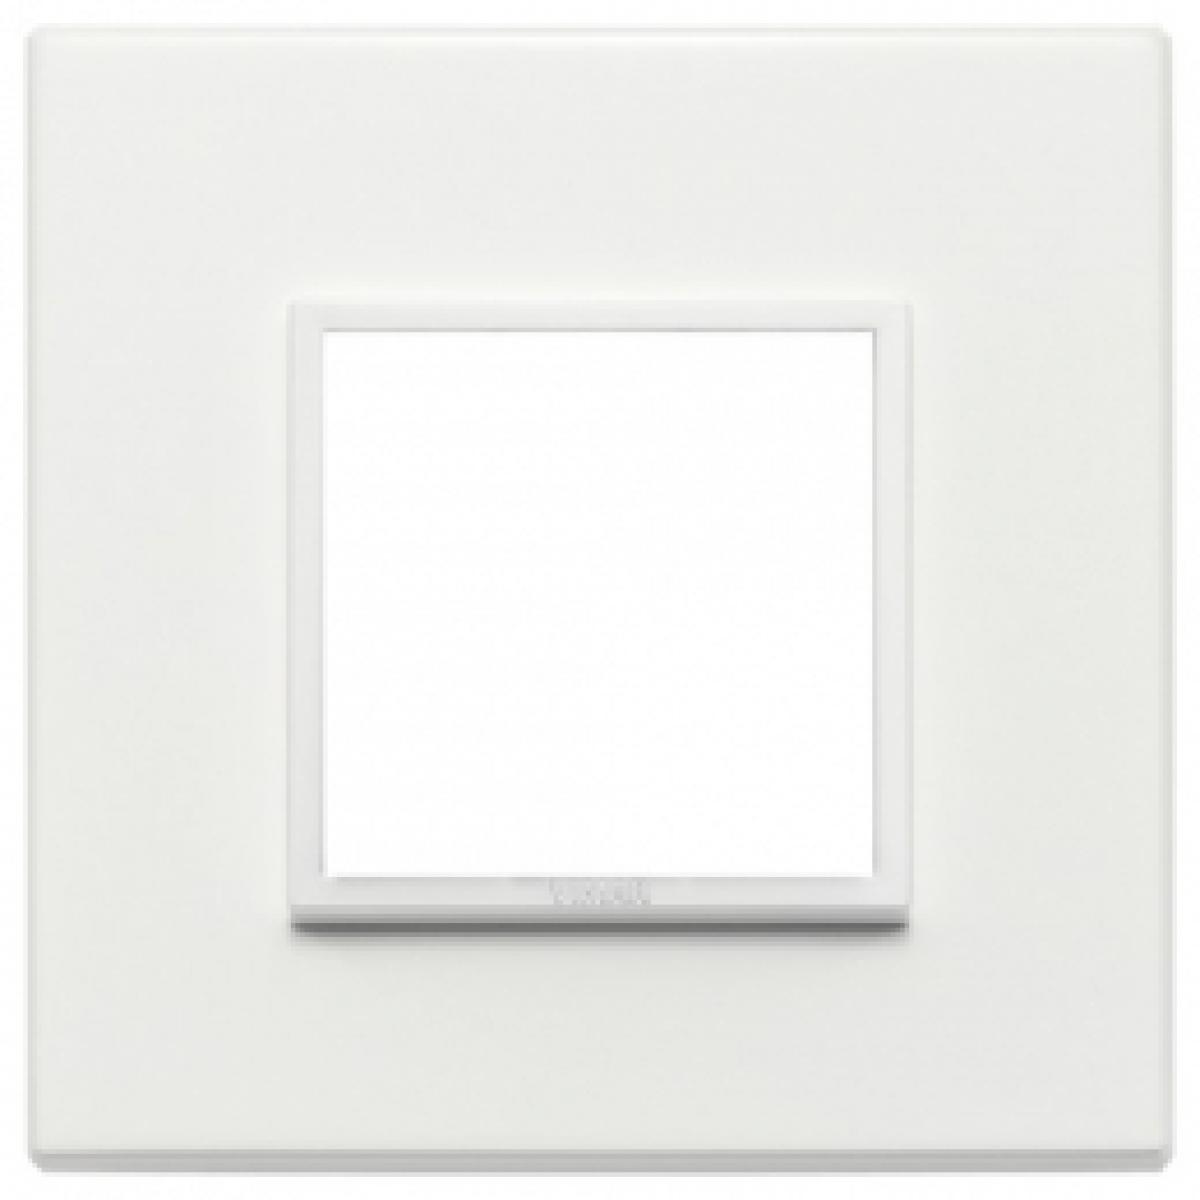 Eikon evo vimar  placca 2 posti colore bianco totale 21642.70